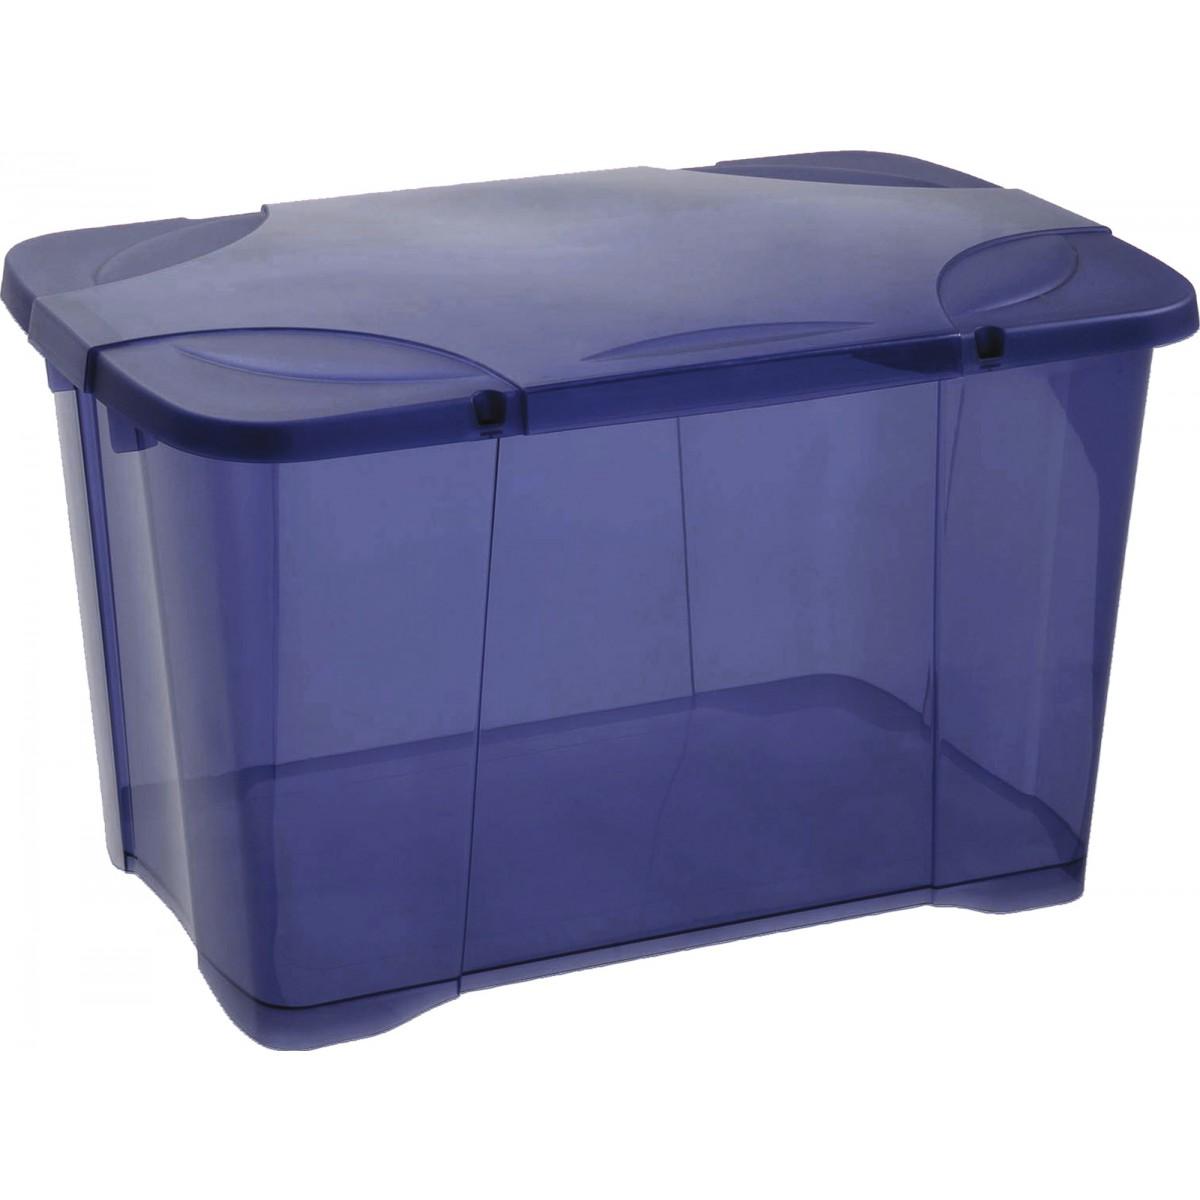 Coffre de rangement Clip'Box Eda - Bleu profond - 60 l de Coffre de rangement